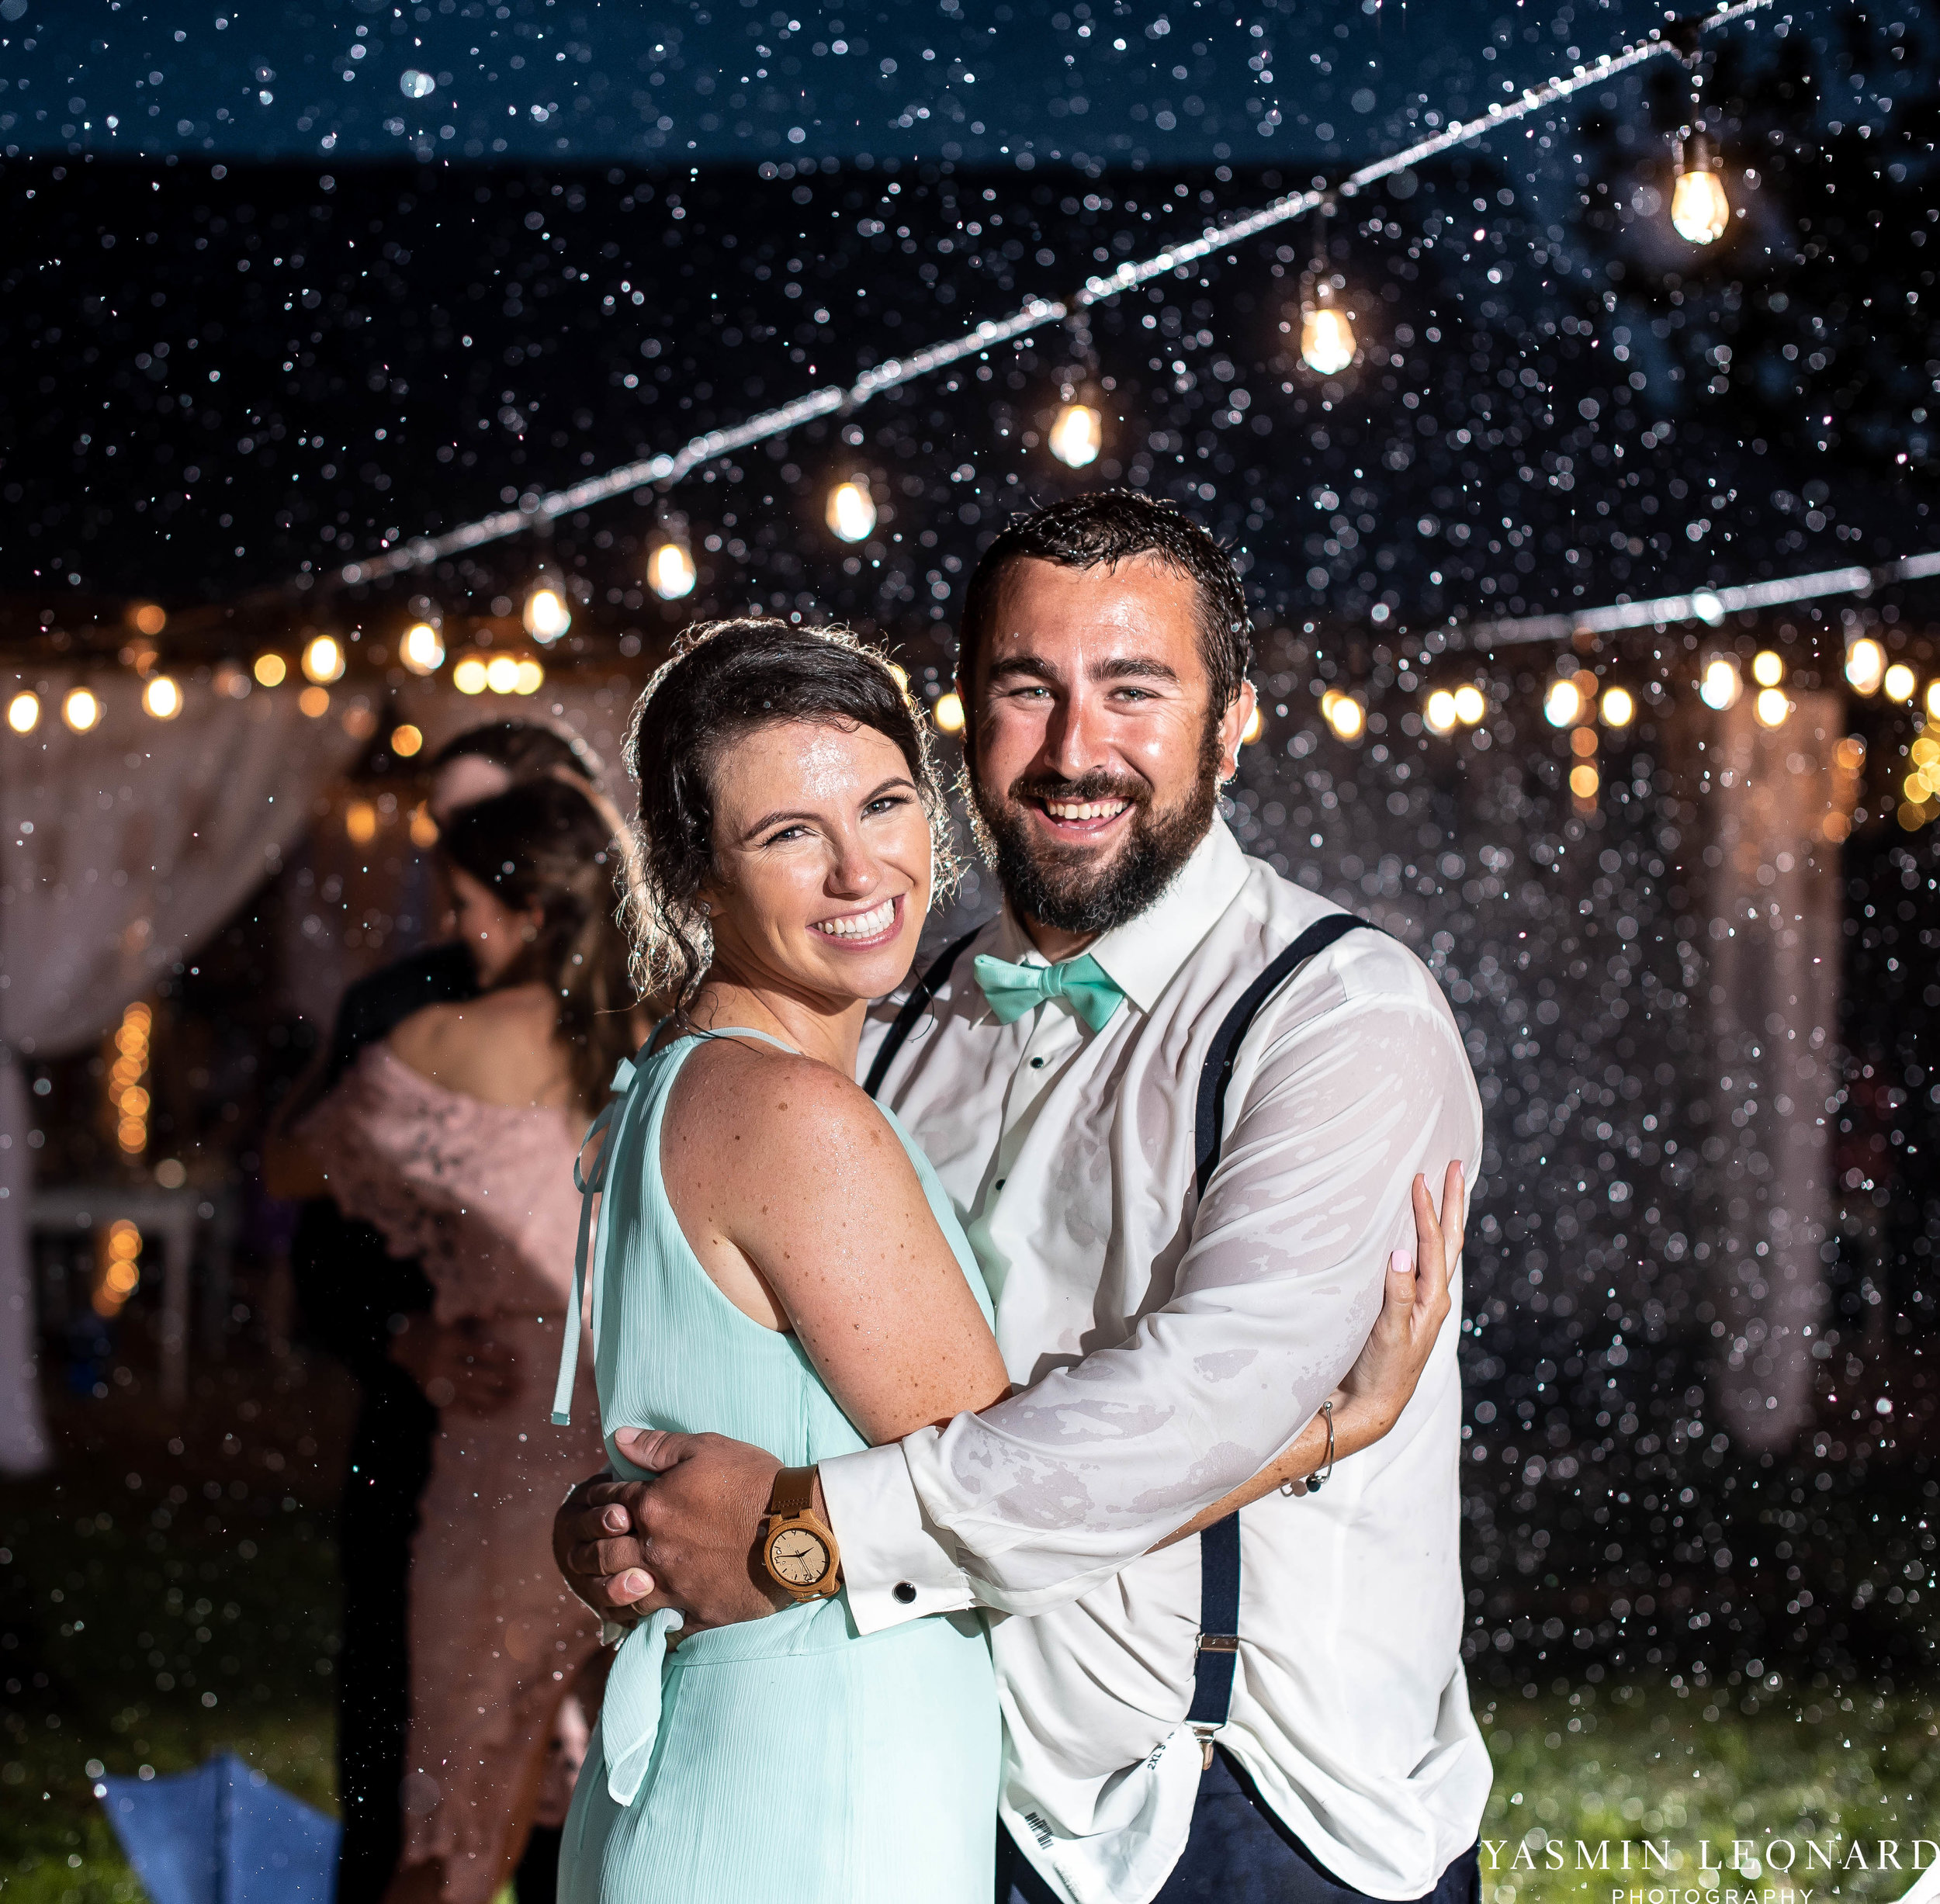 Rain on your wedding day - Rainy Wedding - Plan B for Rain - What to do if it rains on your wedding day - Wedding Inspiration - Outdoor wedding ideas - Rainy Wedding Pictures - Yasmin Leonard Photography-83.jpg